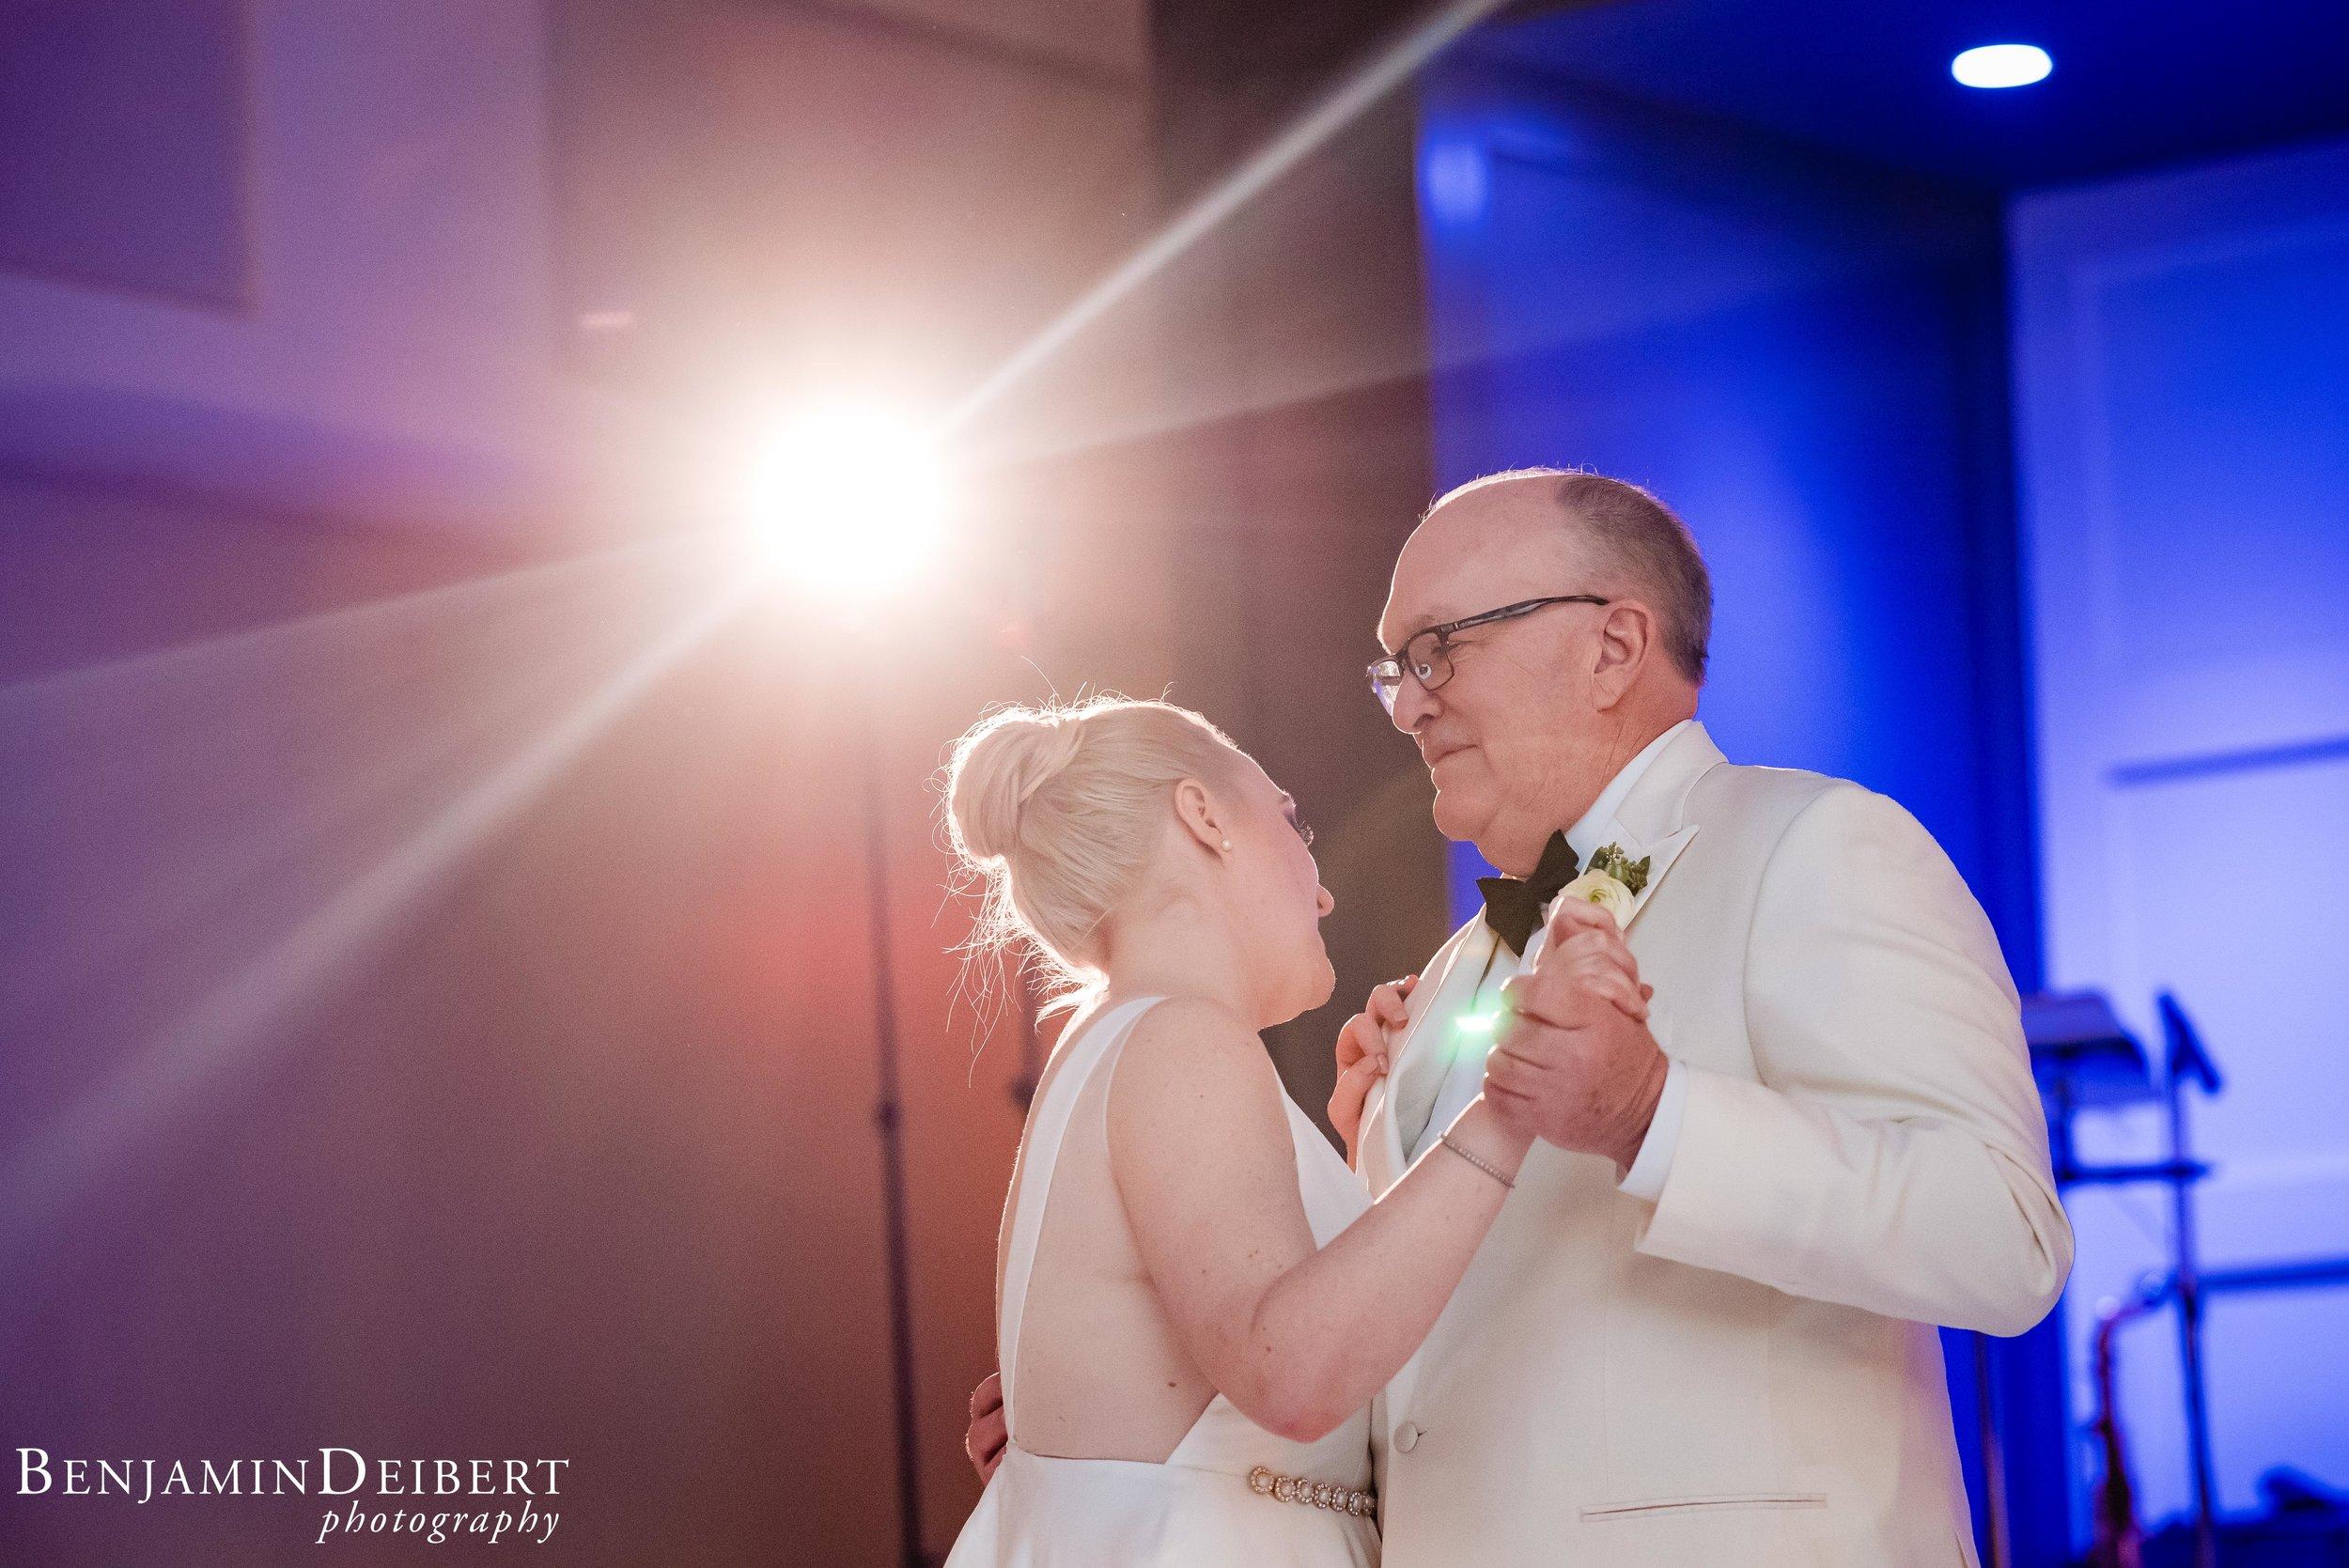 PatriceandAdam_TheLucy__Cescaphe_Wedding-68.jpg